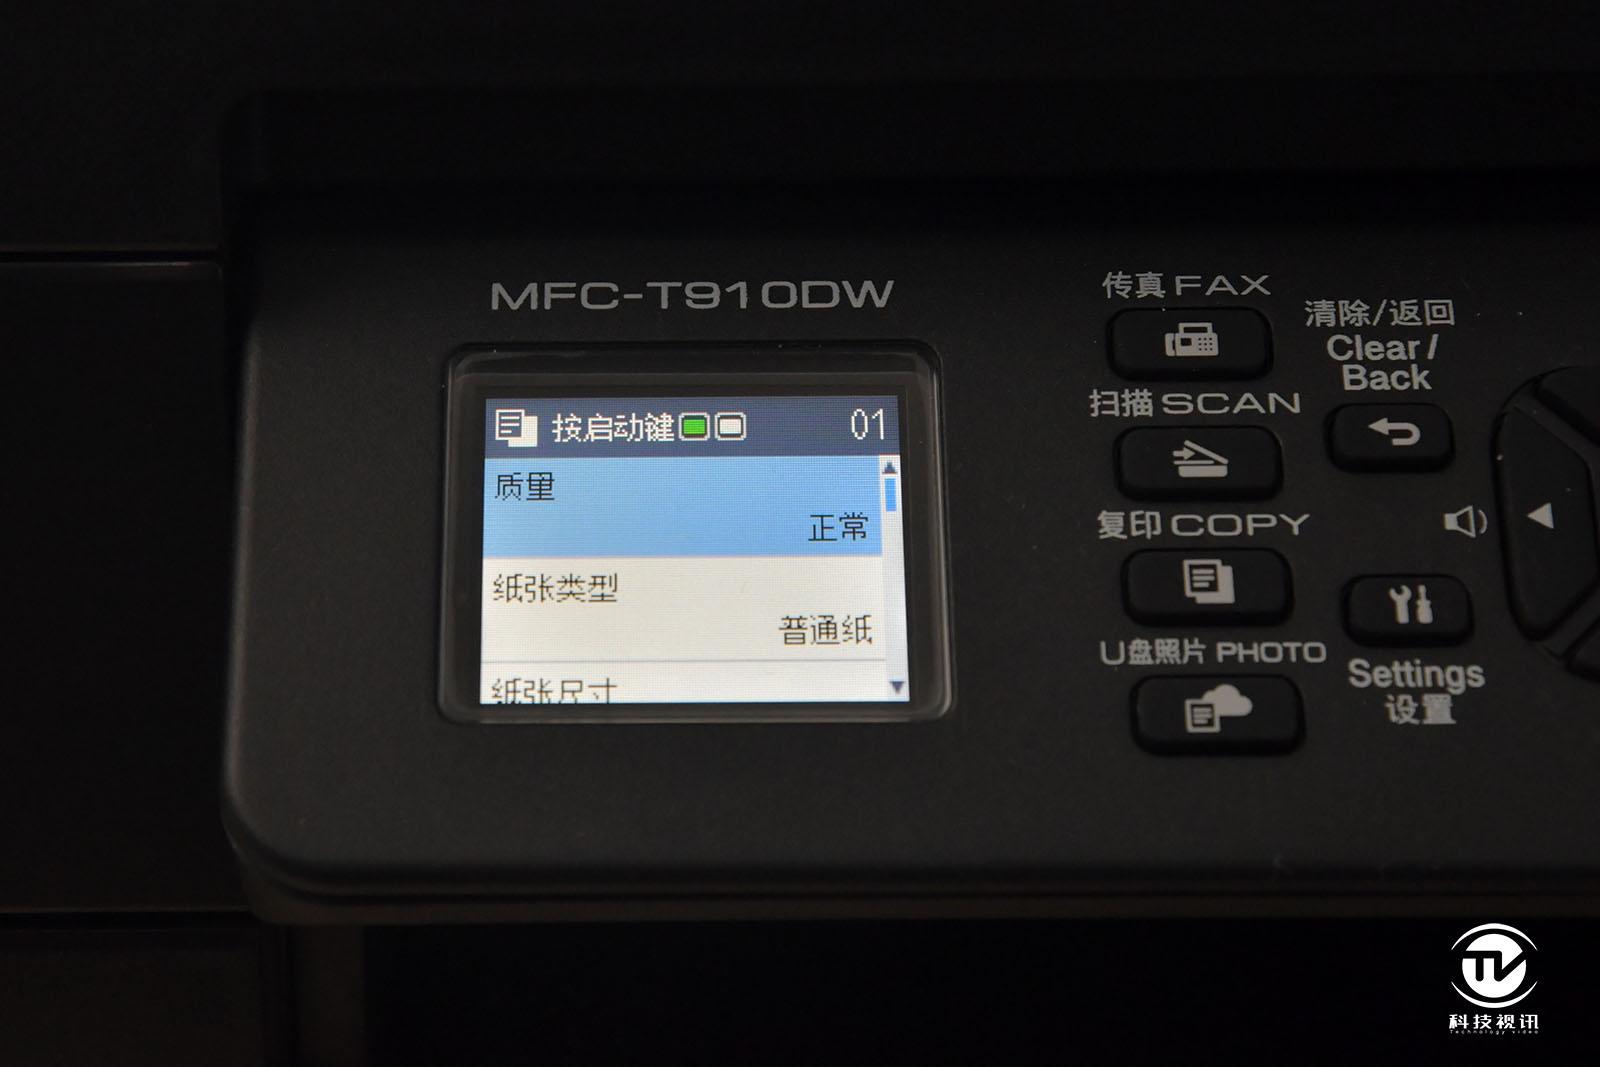 DSC_8386.JPG